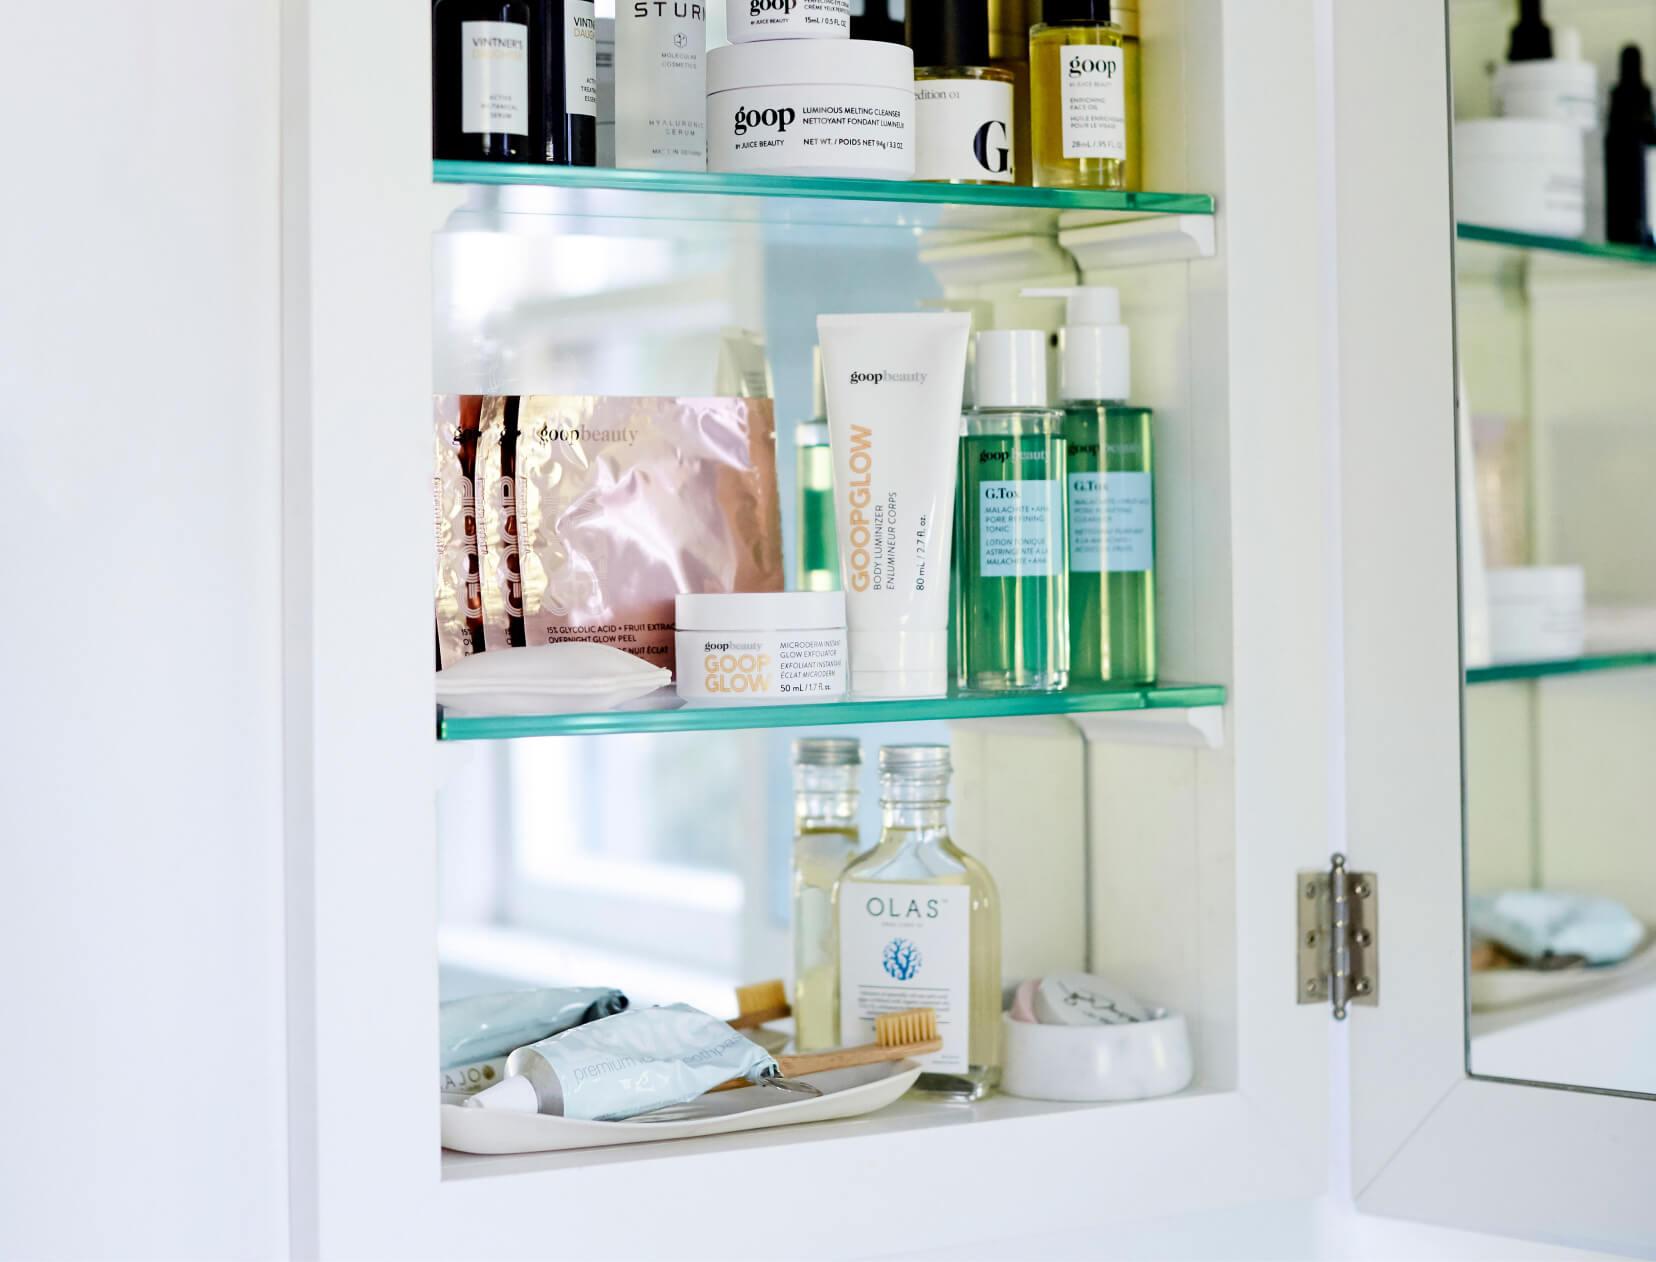 Clean Beauty - What Is Clean Beauty? | Goop